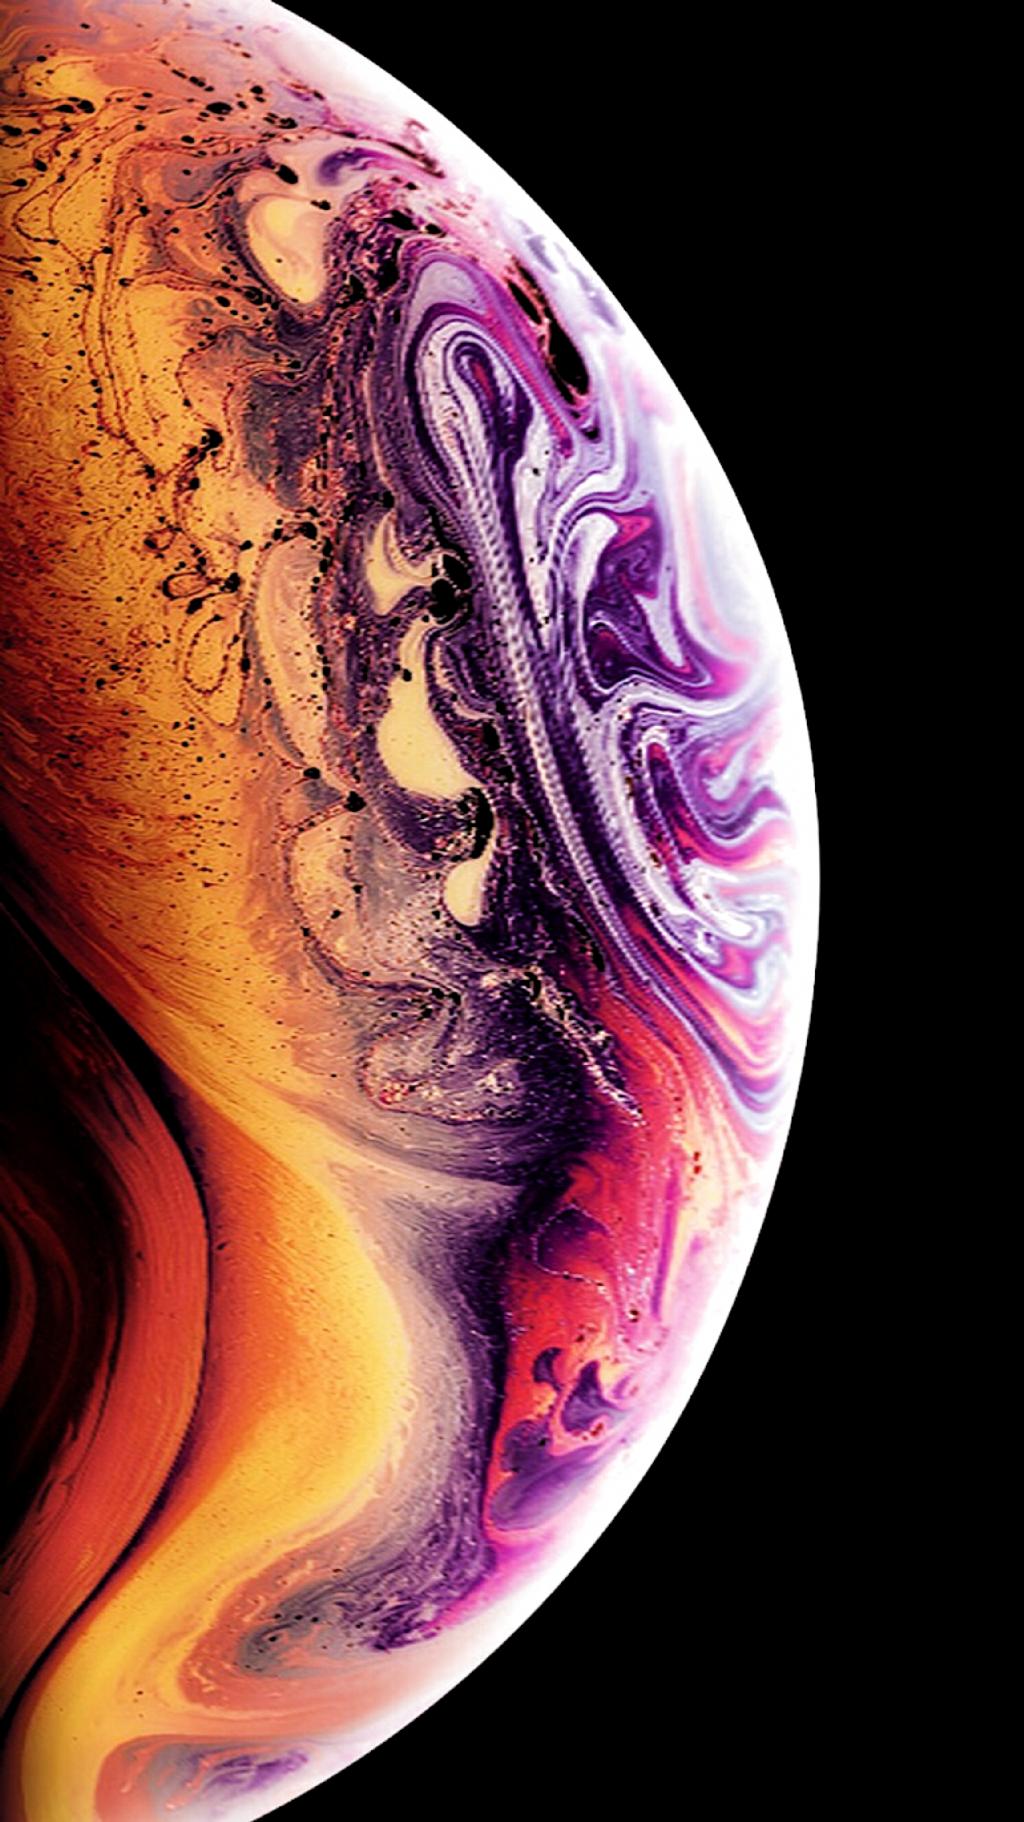 خلفيات ايفون Iphone Xr Xs Wallpaper Hd Tecnologis Iphone Wallpaper 4kwallpaper Wallpaper Iphone Ios7 Iphone Wallpaper Ios Abstract Iphone Wallpaper